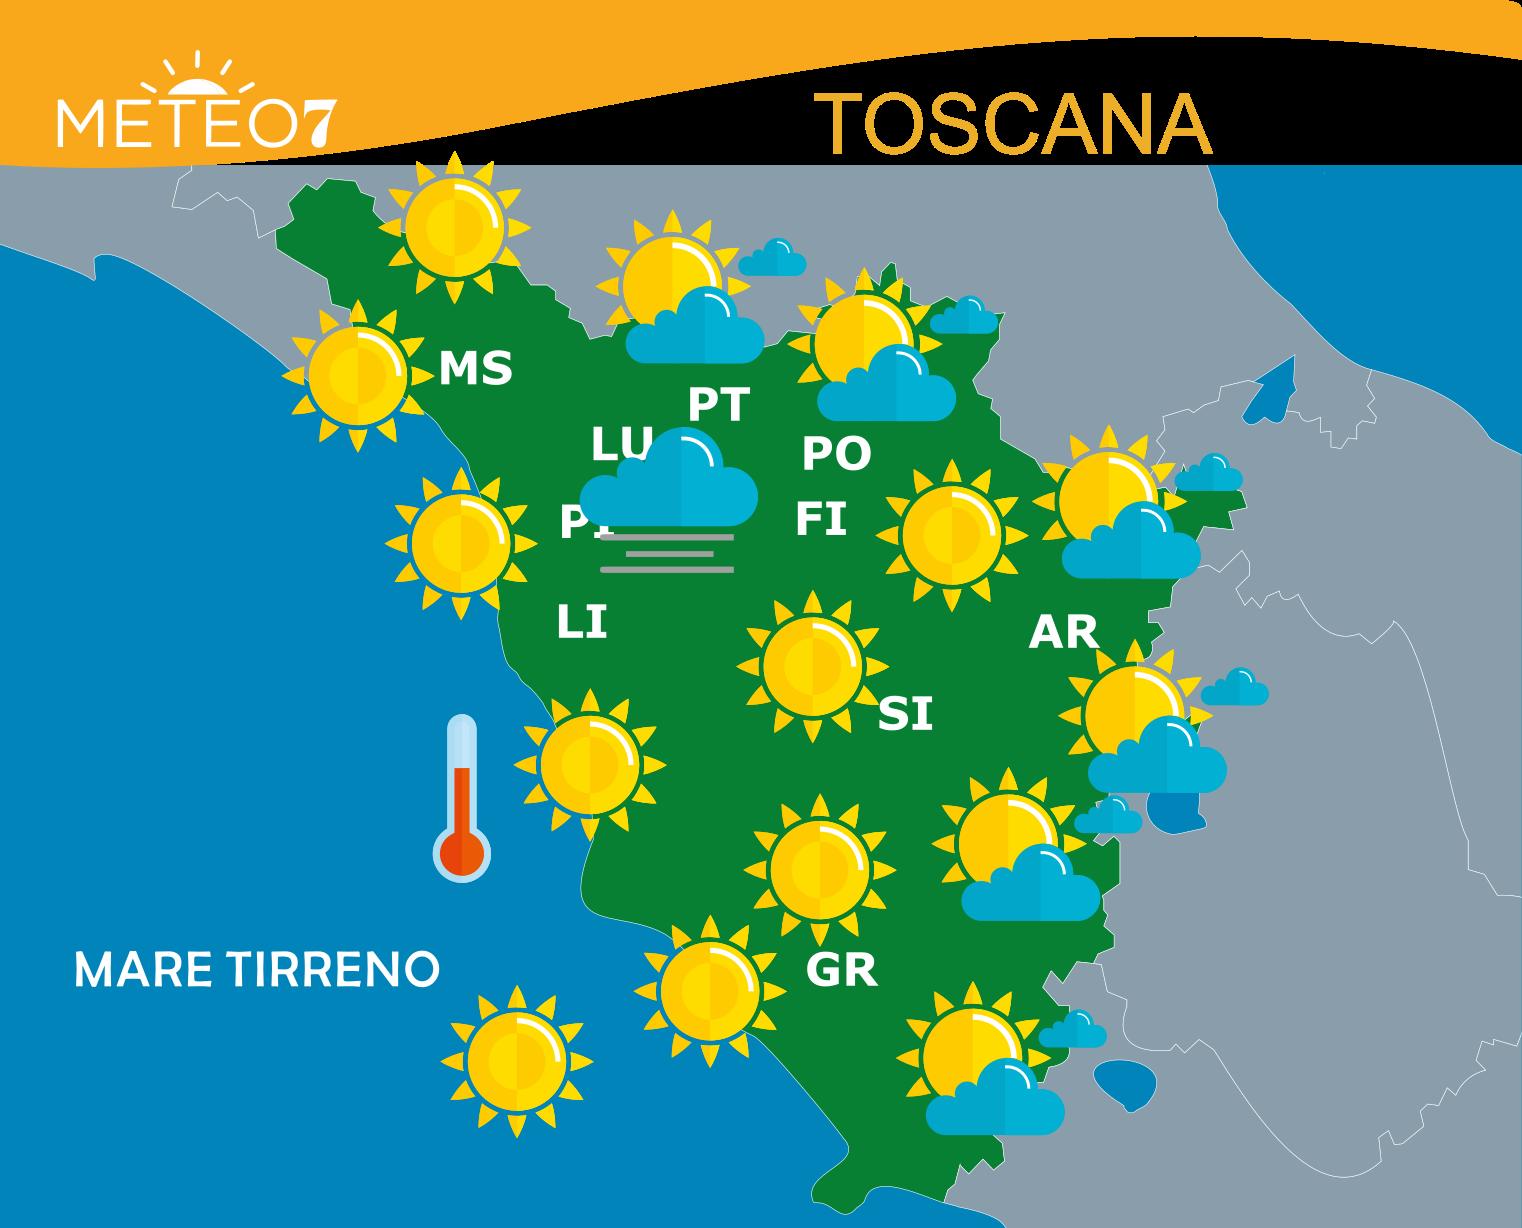 meteo toscana 19 Giugno 2019